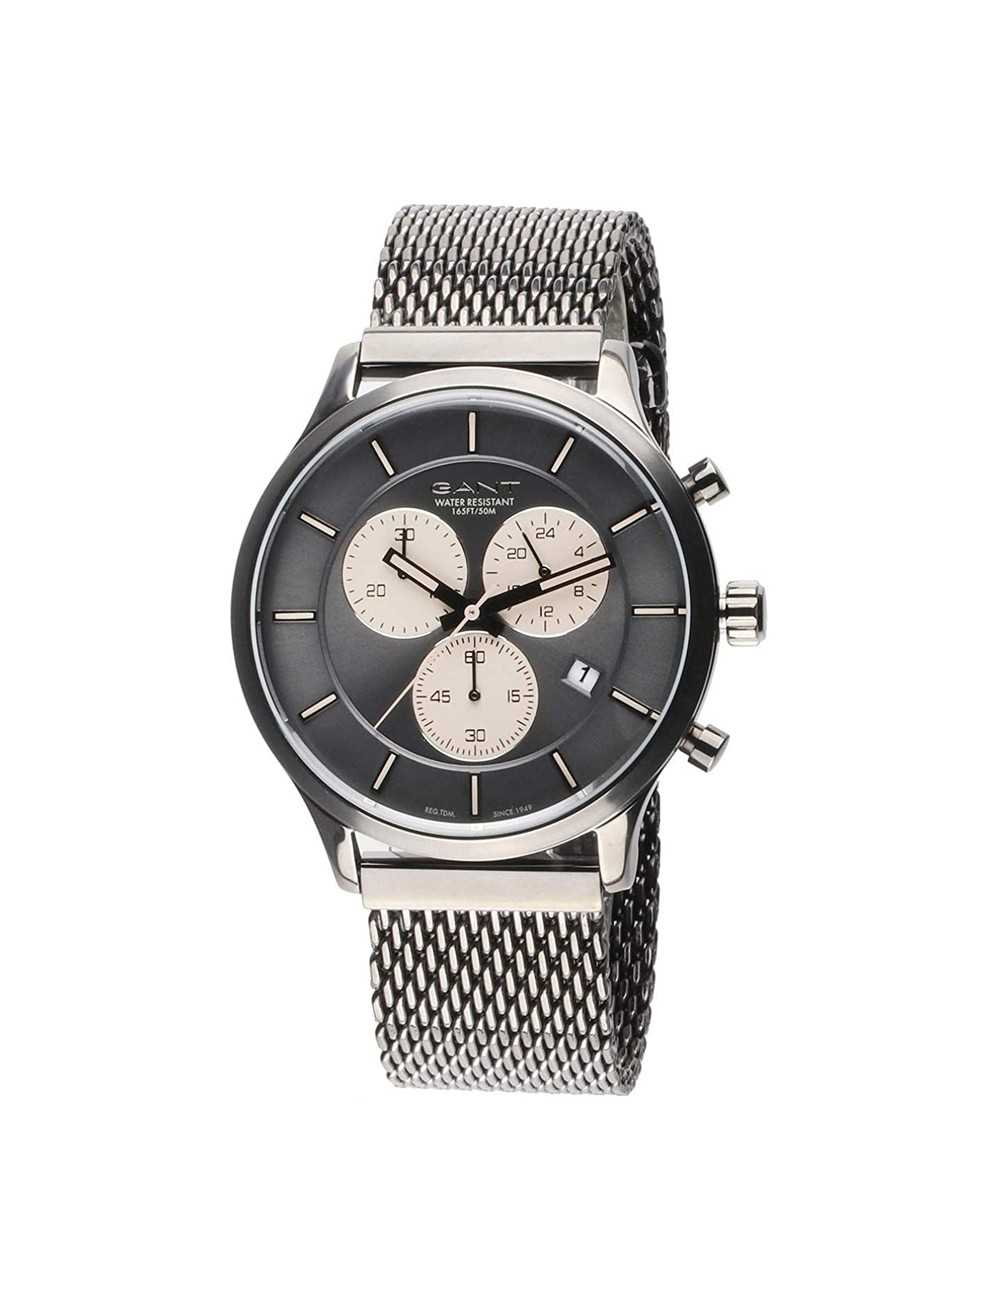 Gant Greenville GTAD00200899I Mens Watch Chronograph